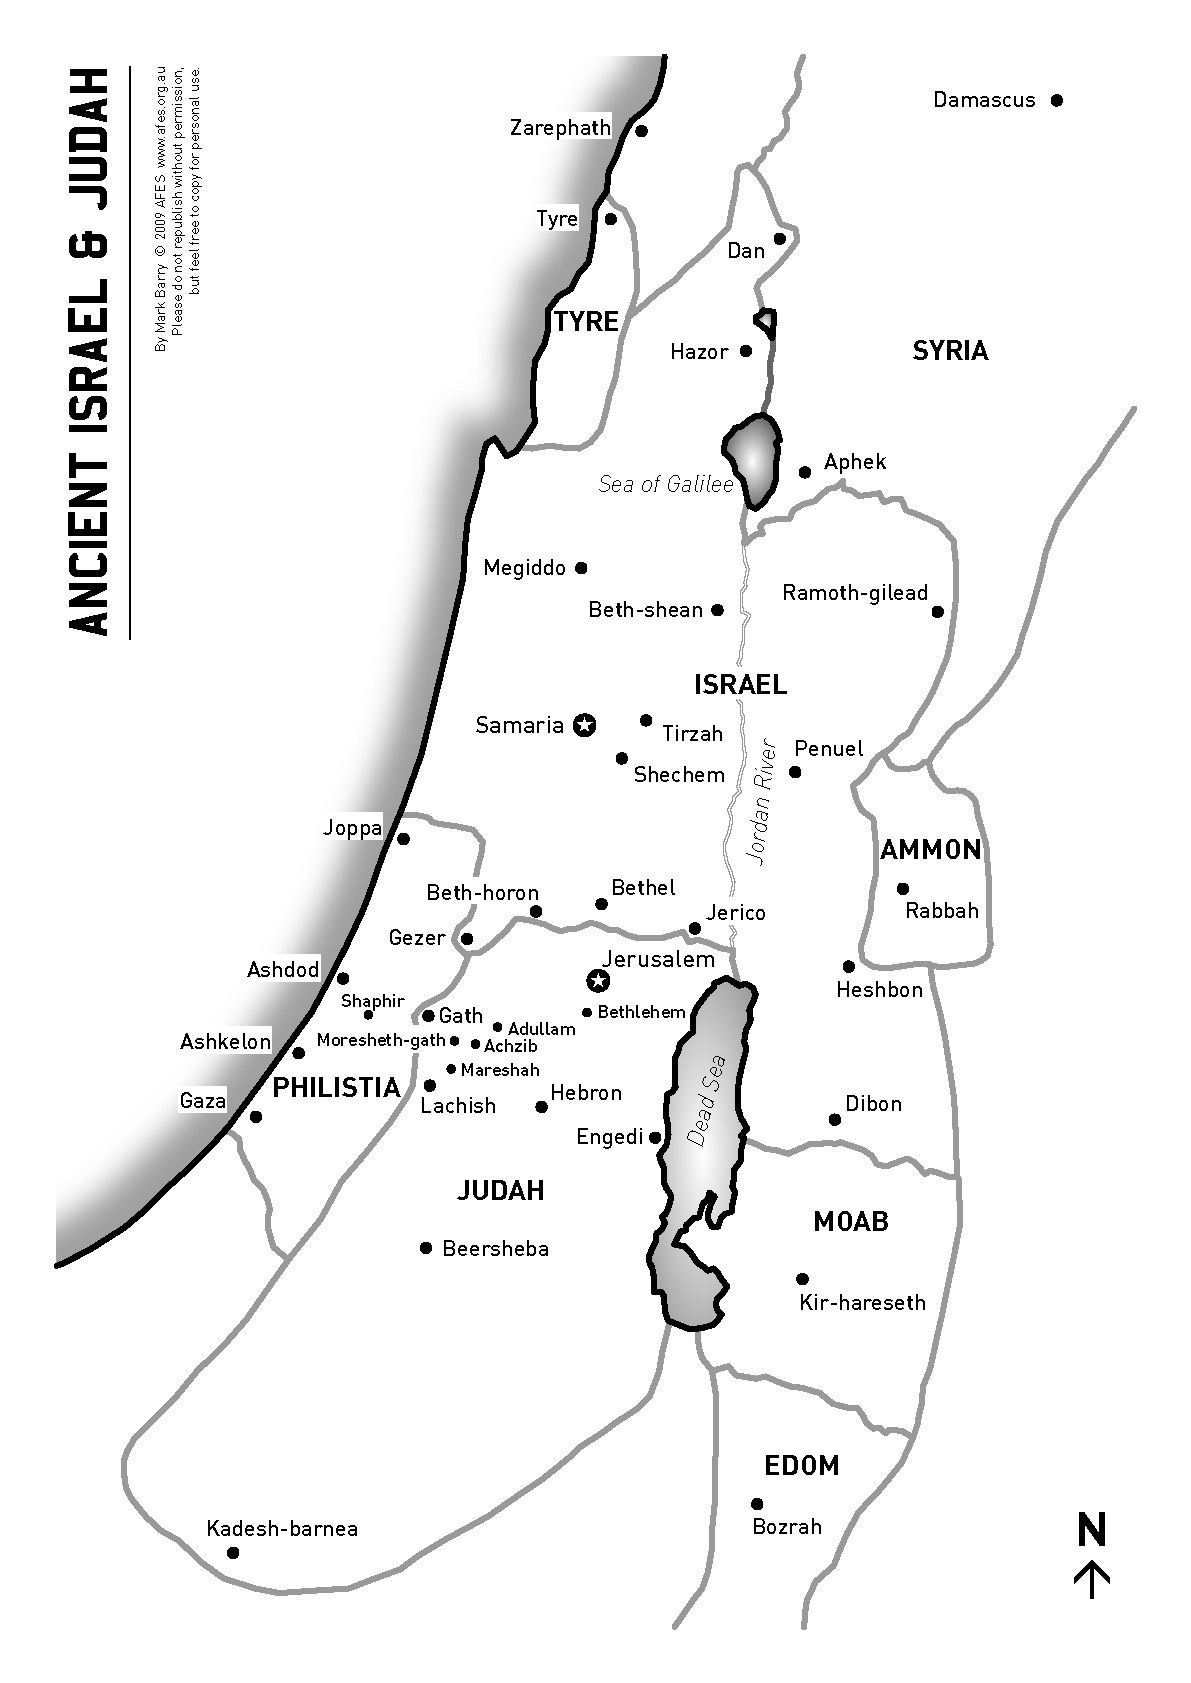 A Map Of Ancient Israel And Judah Version